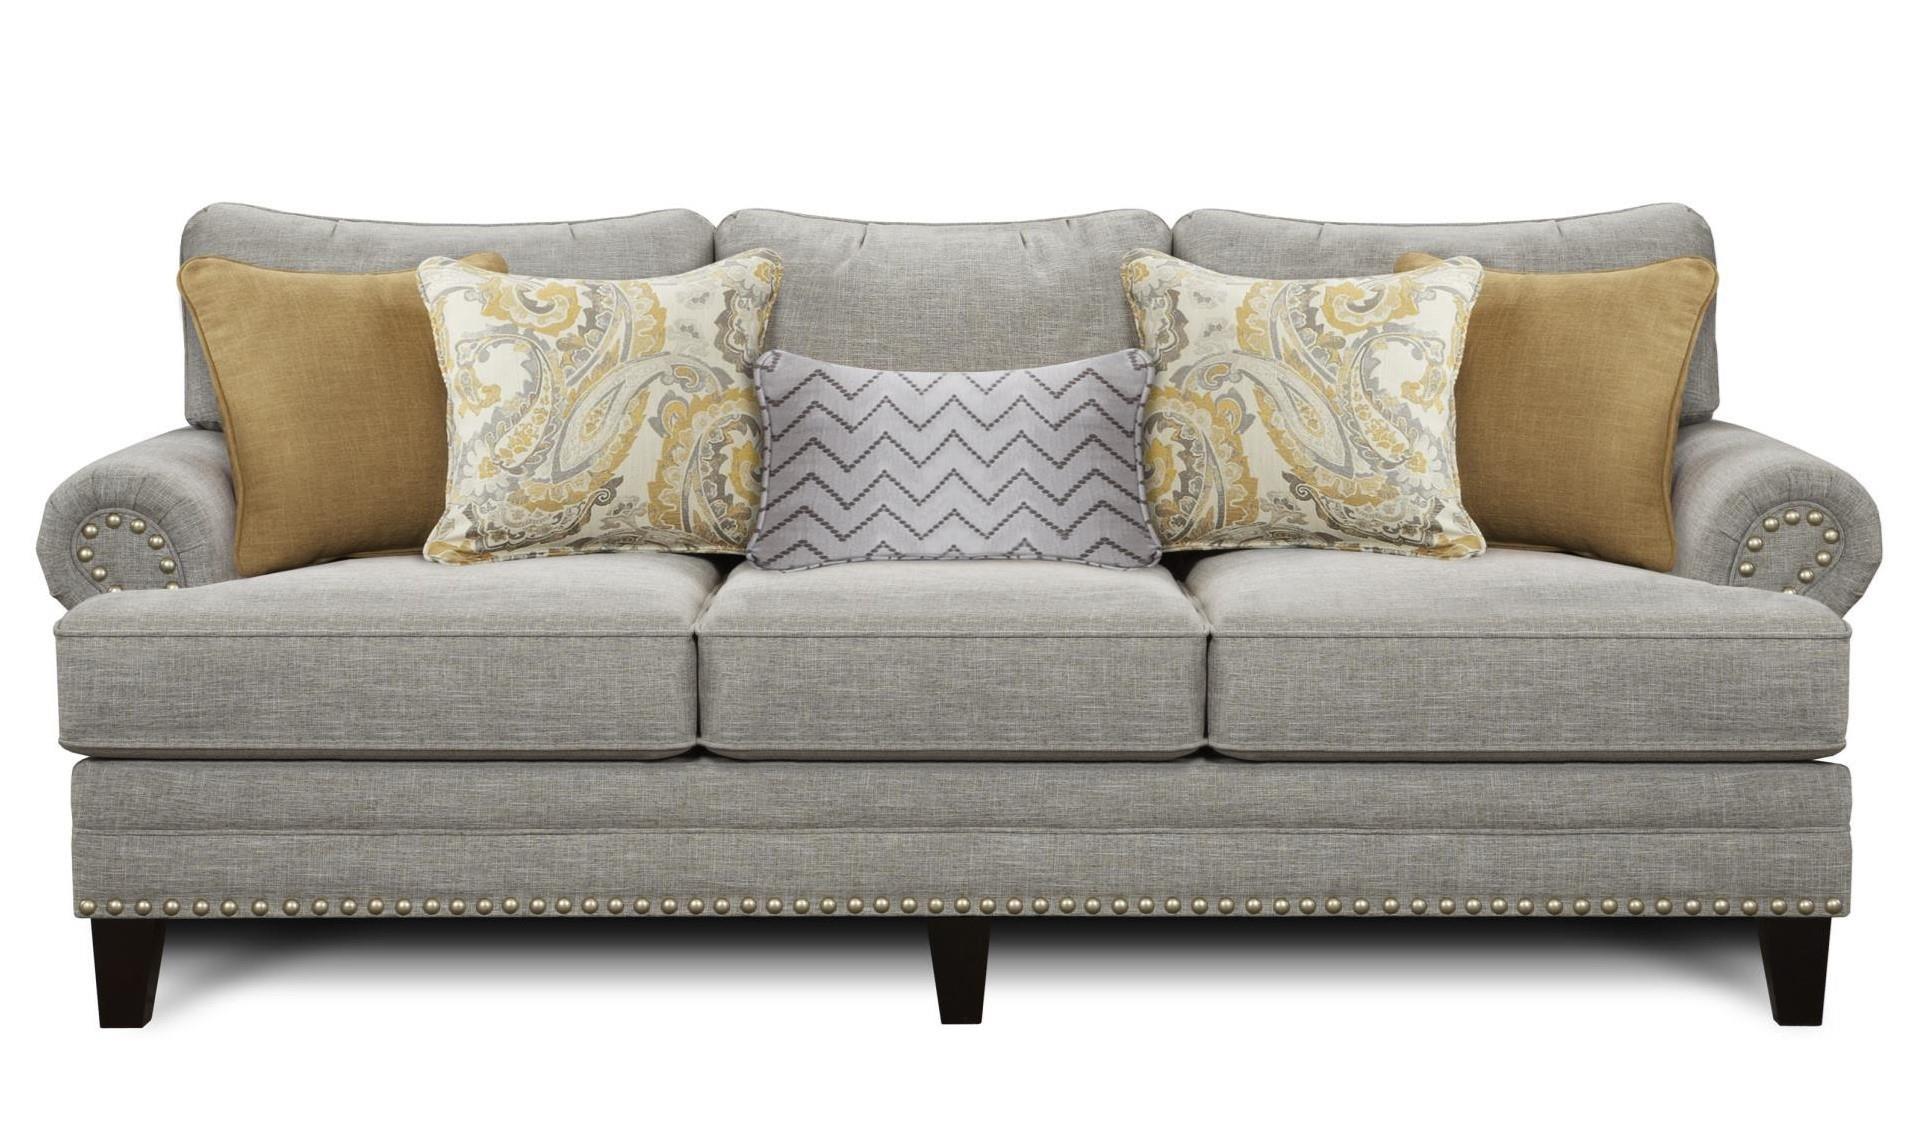 Fusion Furniture 2830 Hobbs Sofa - Item Number: 2830-KP HOBBS-FLANNEL